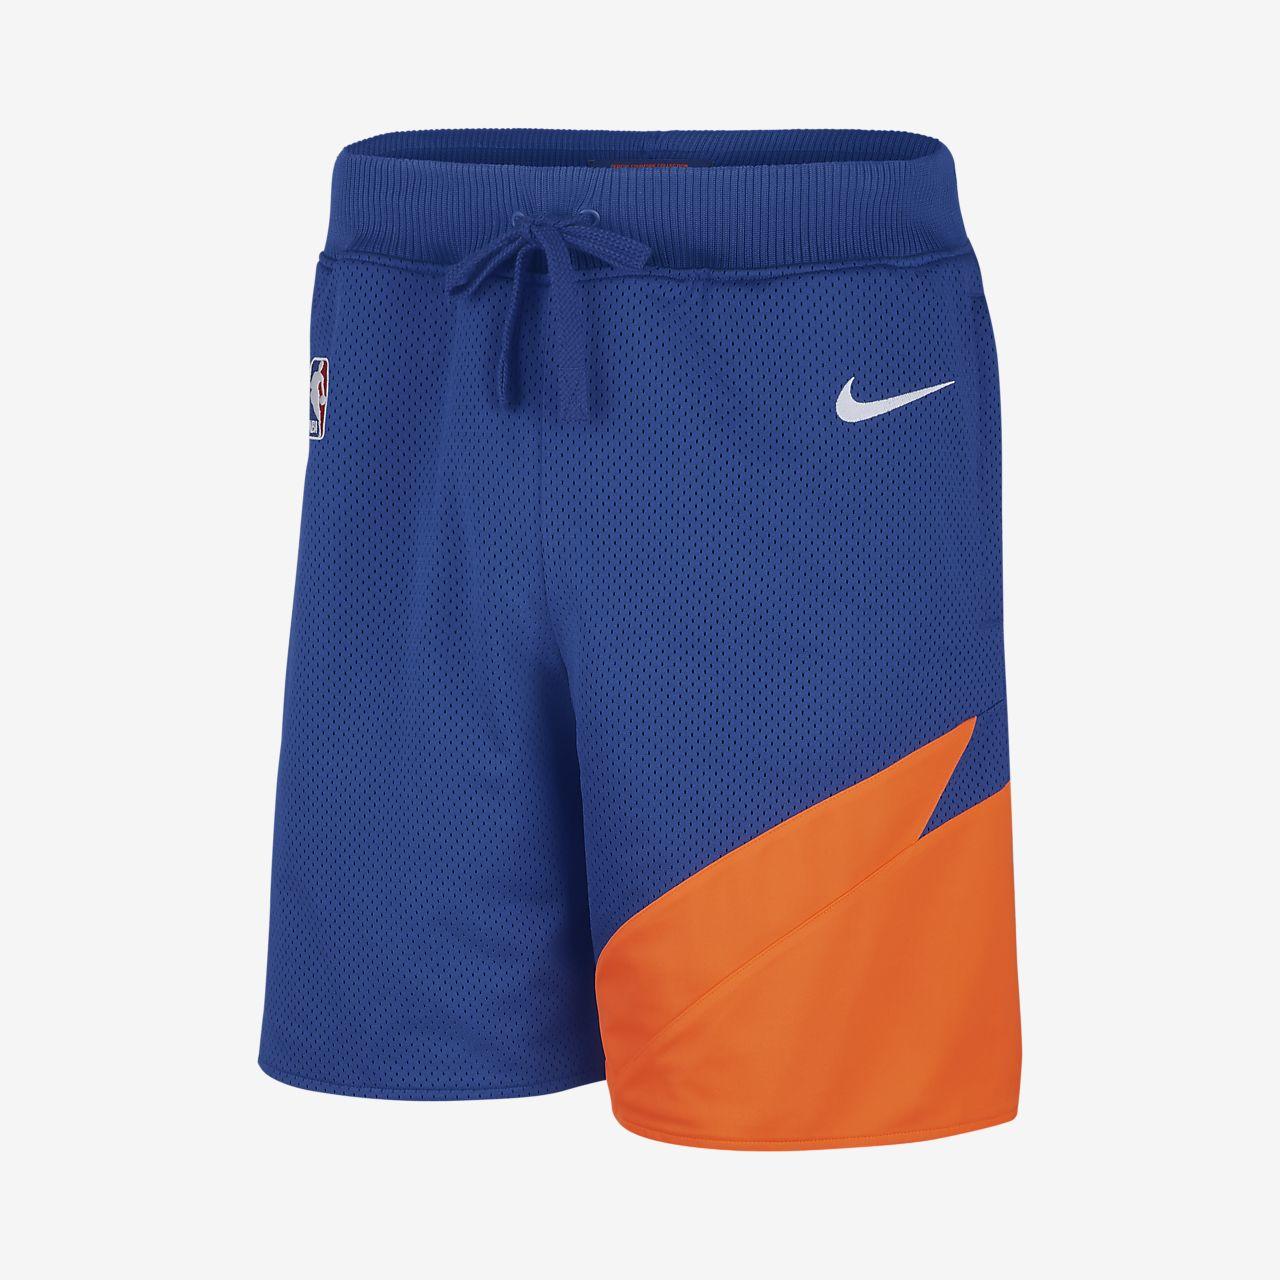 Shorts de la NBA para hombre Cleveland Cavaliers Nike Courtside ... 31315391e2d